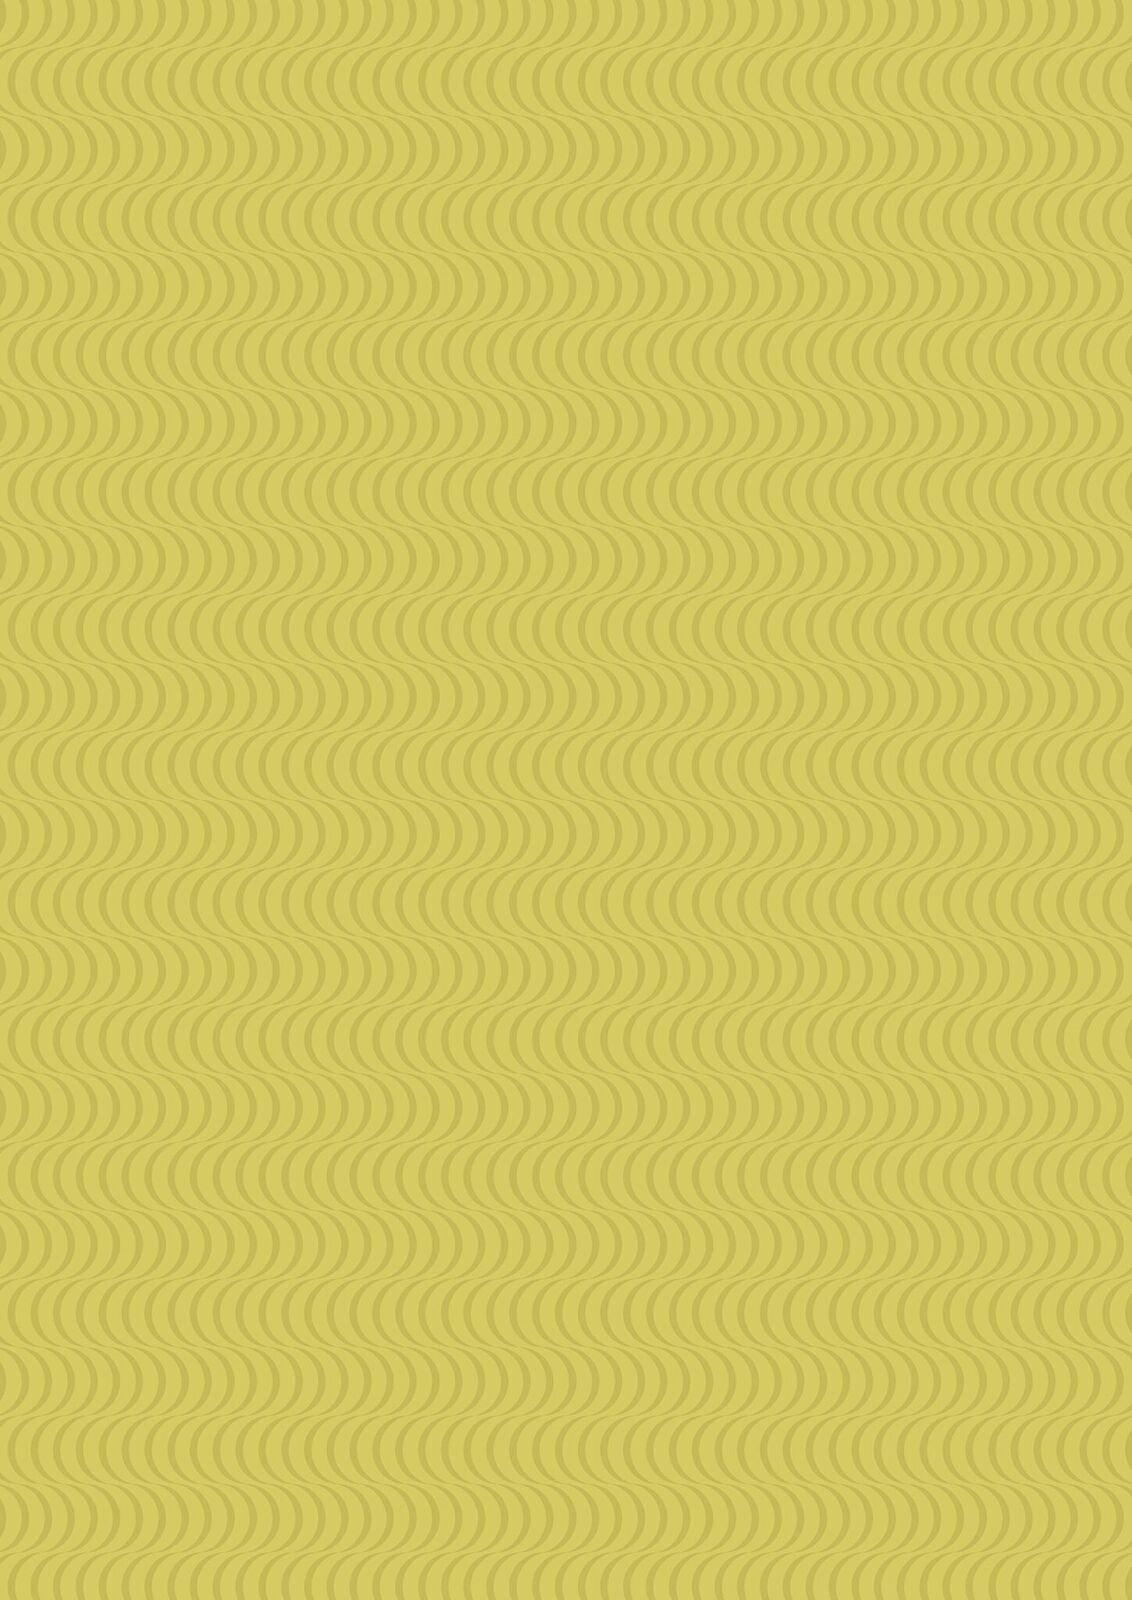 Lewis & Irene Geometrix - Green with Scallops - GX3.2